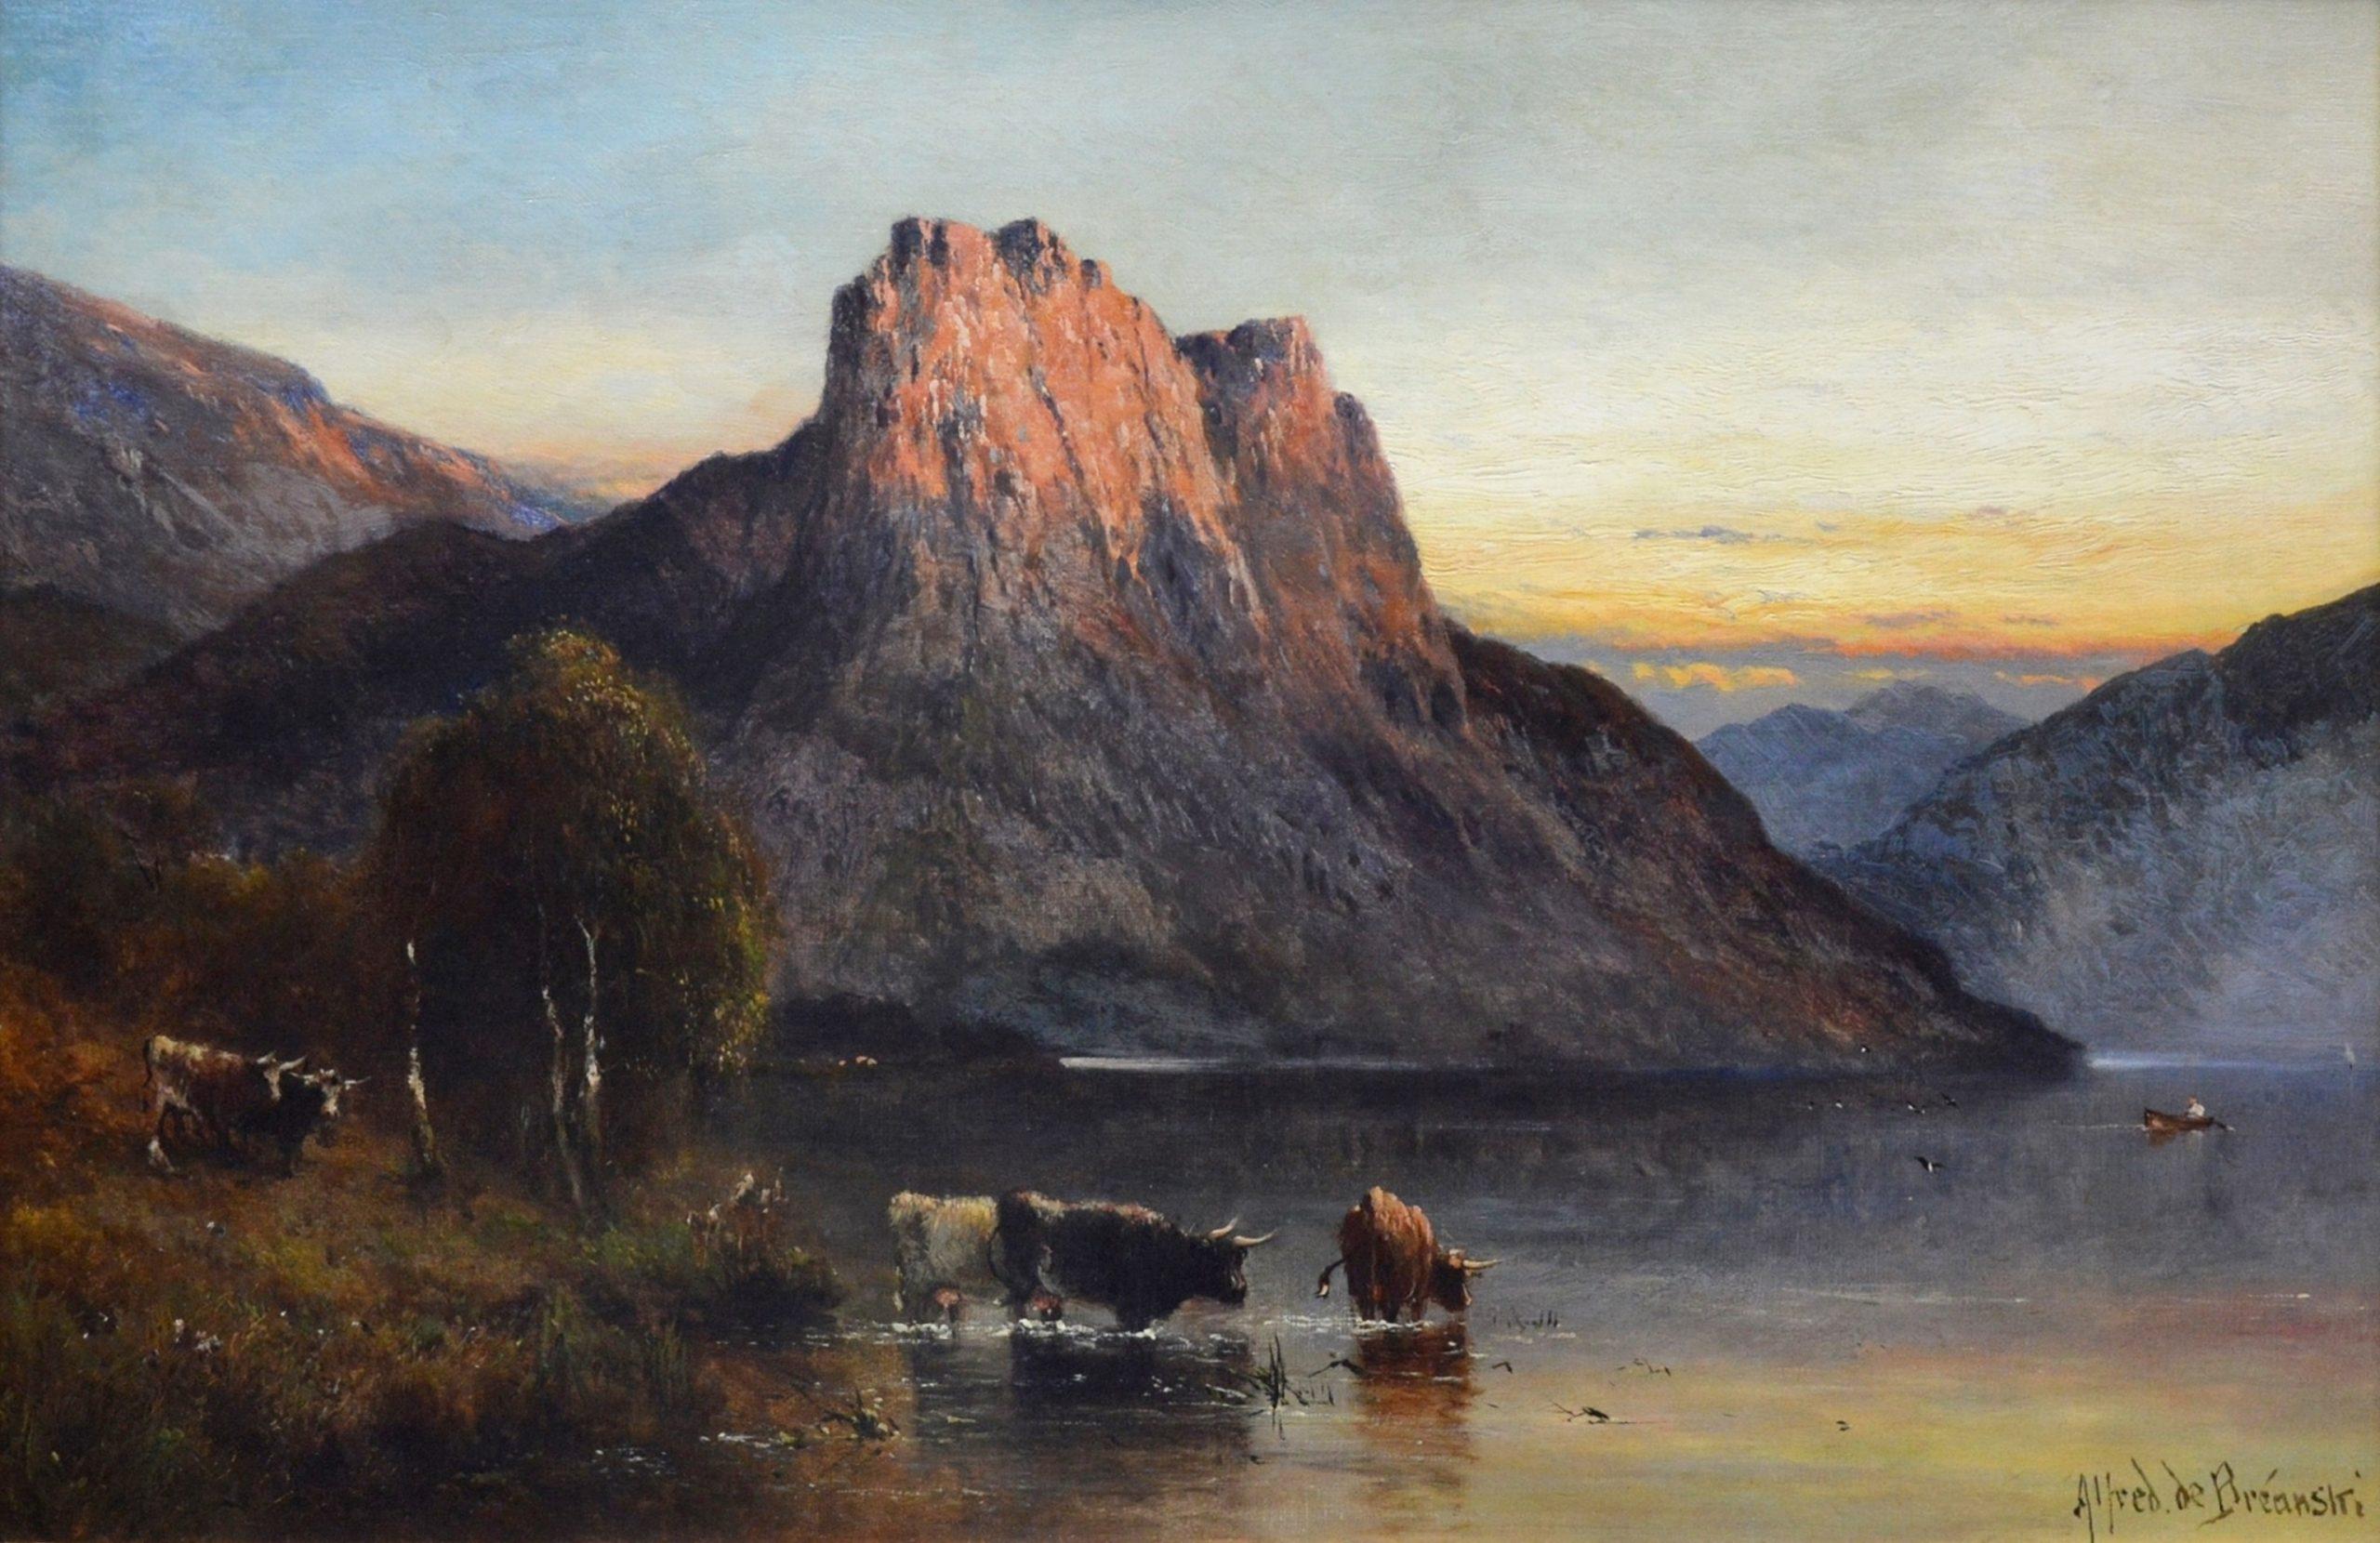 Falcon Craig, Derwentshire - 19th Century Landscape Oil Painting Image